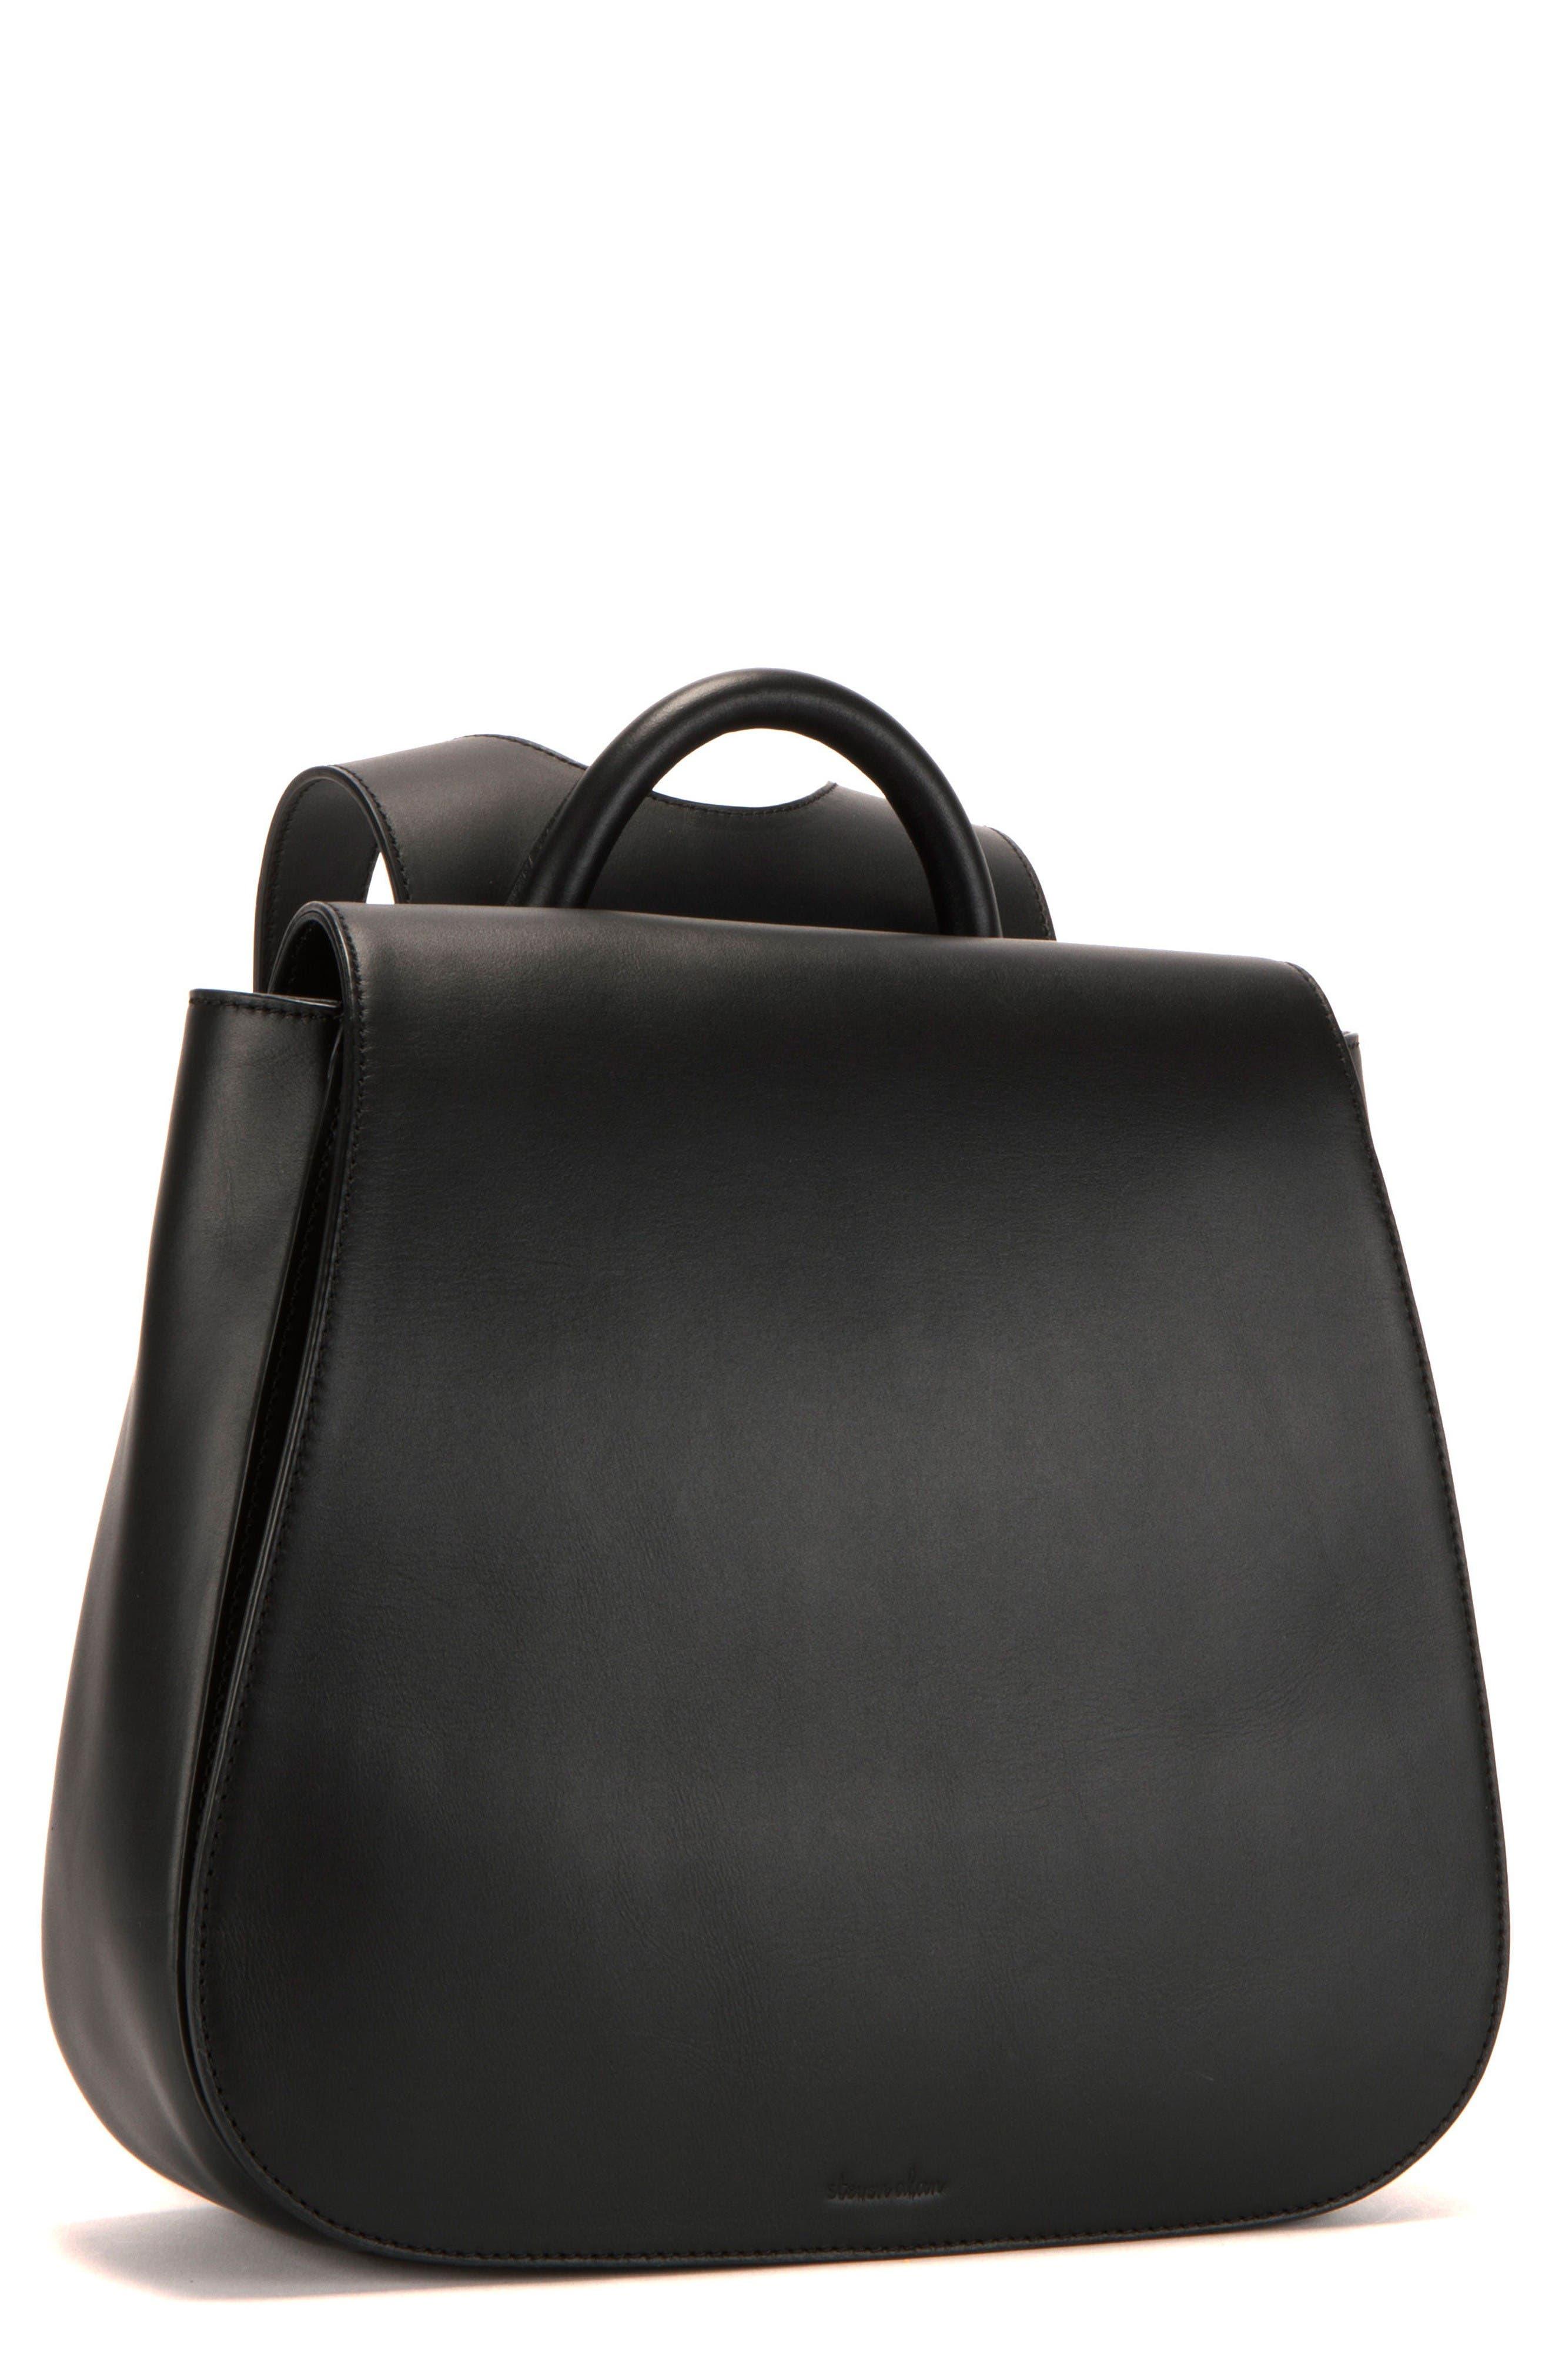 Steven Alan Kate Calfskin Leather Backpack